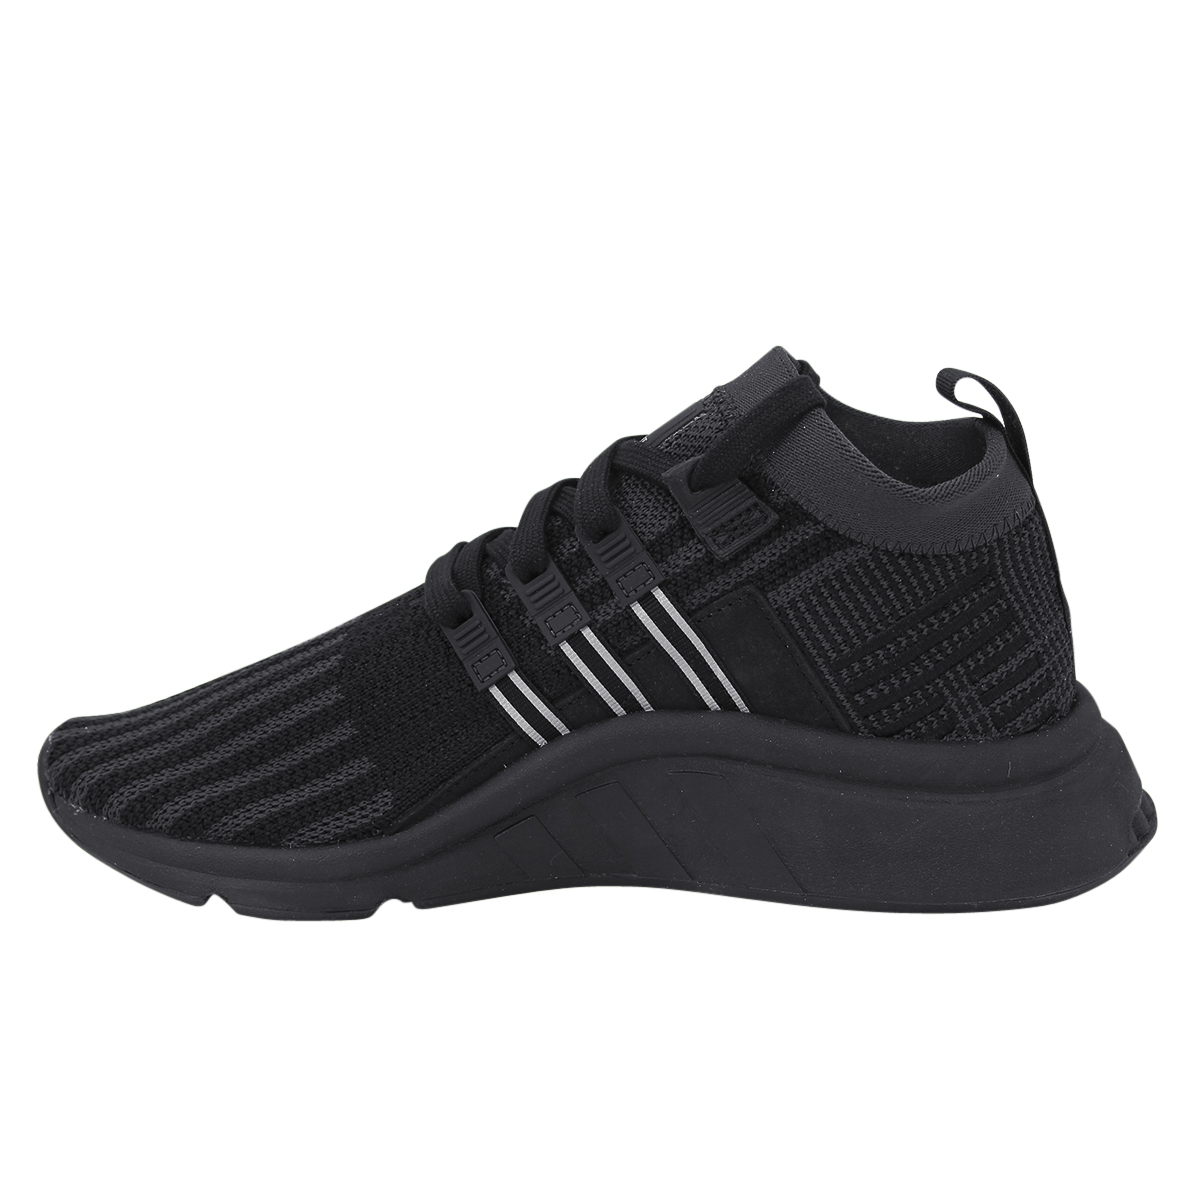 Adidas Herren Sneakers Schuhe NeuEbay Eqt Support Primeknit Mid Adv DHEIW29Y